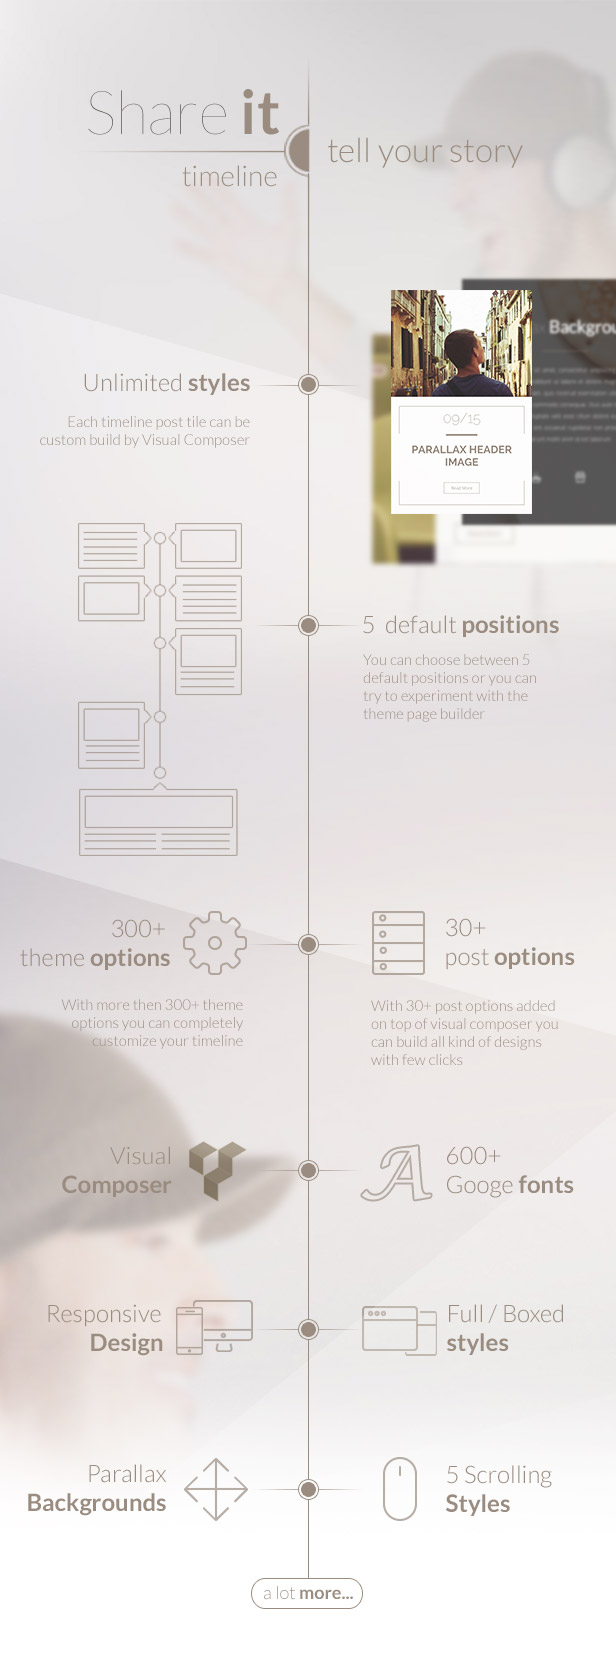 Share It - Timeline WordPress Theme - 4